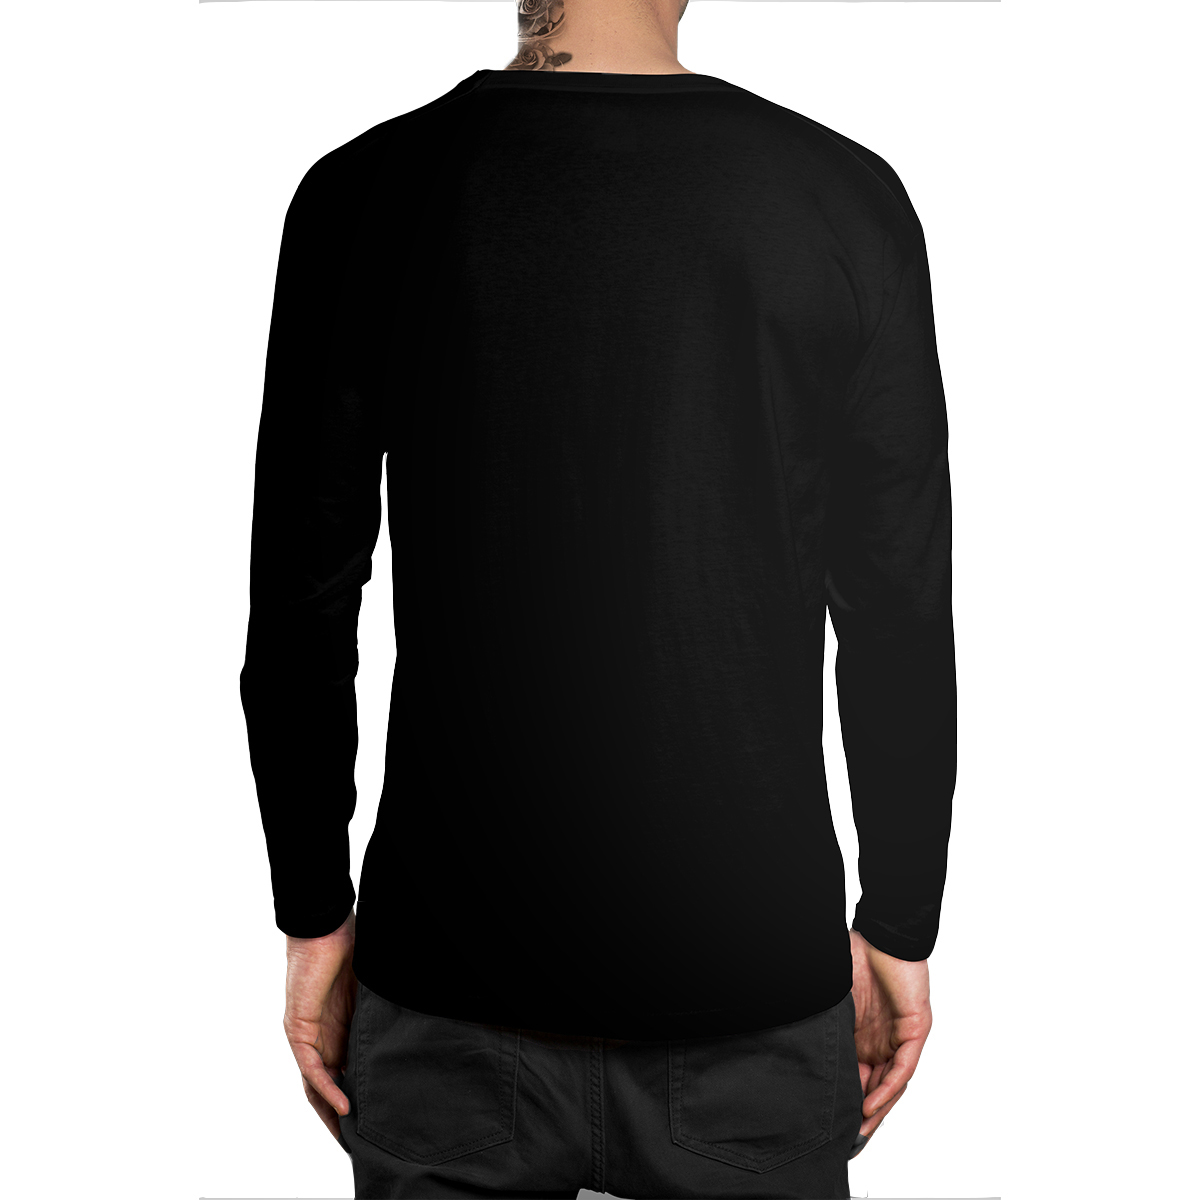 Stompy Camiseta Manga Longa Modelo 47